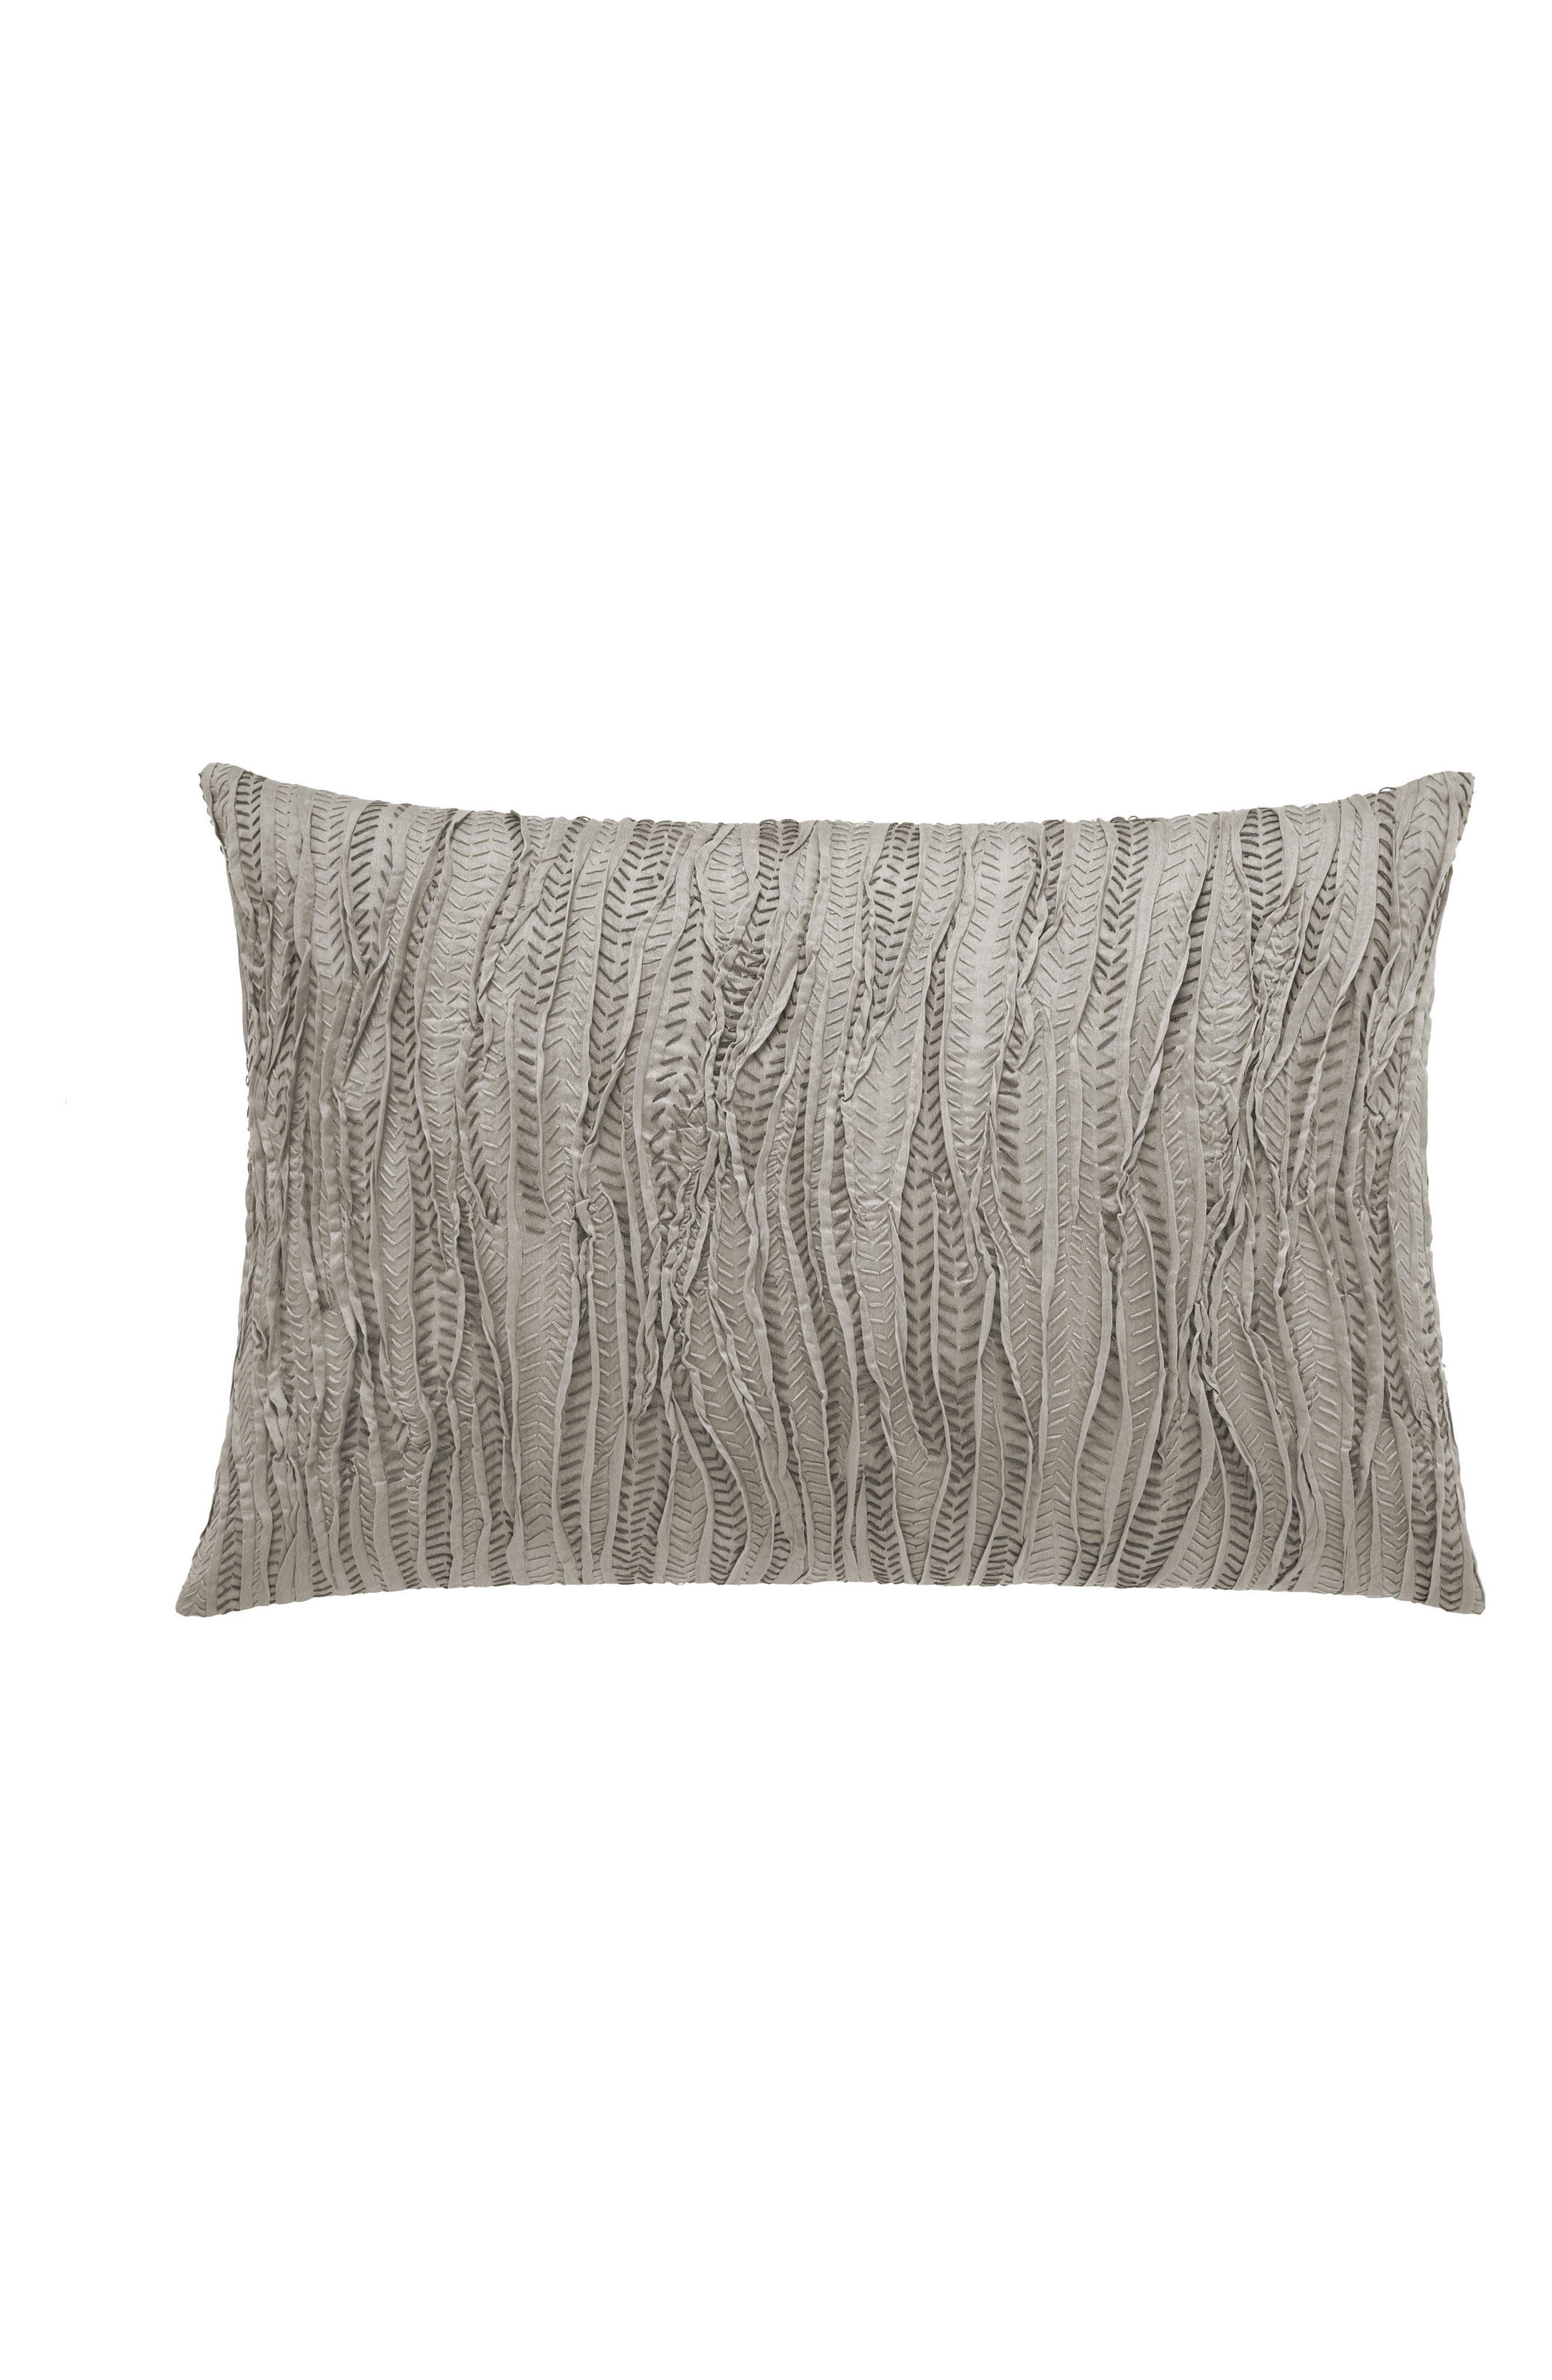 Vera Wang Lux Marble Shibori Breakfast Accent Pillow